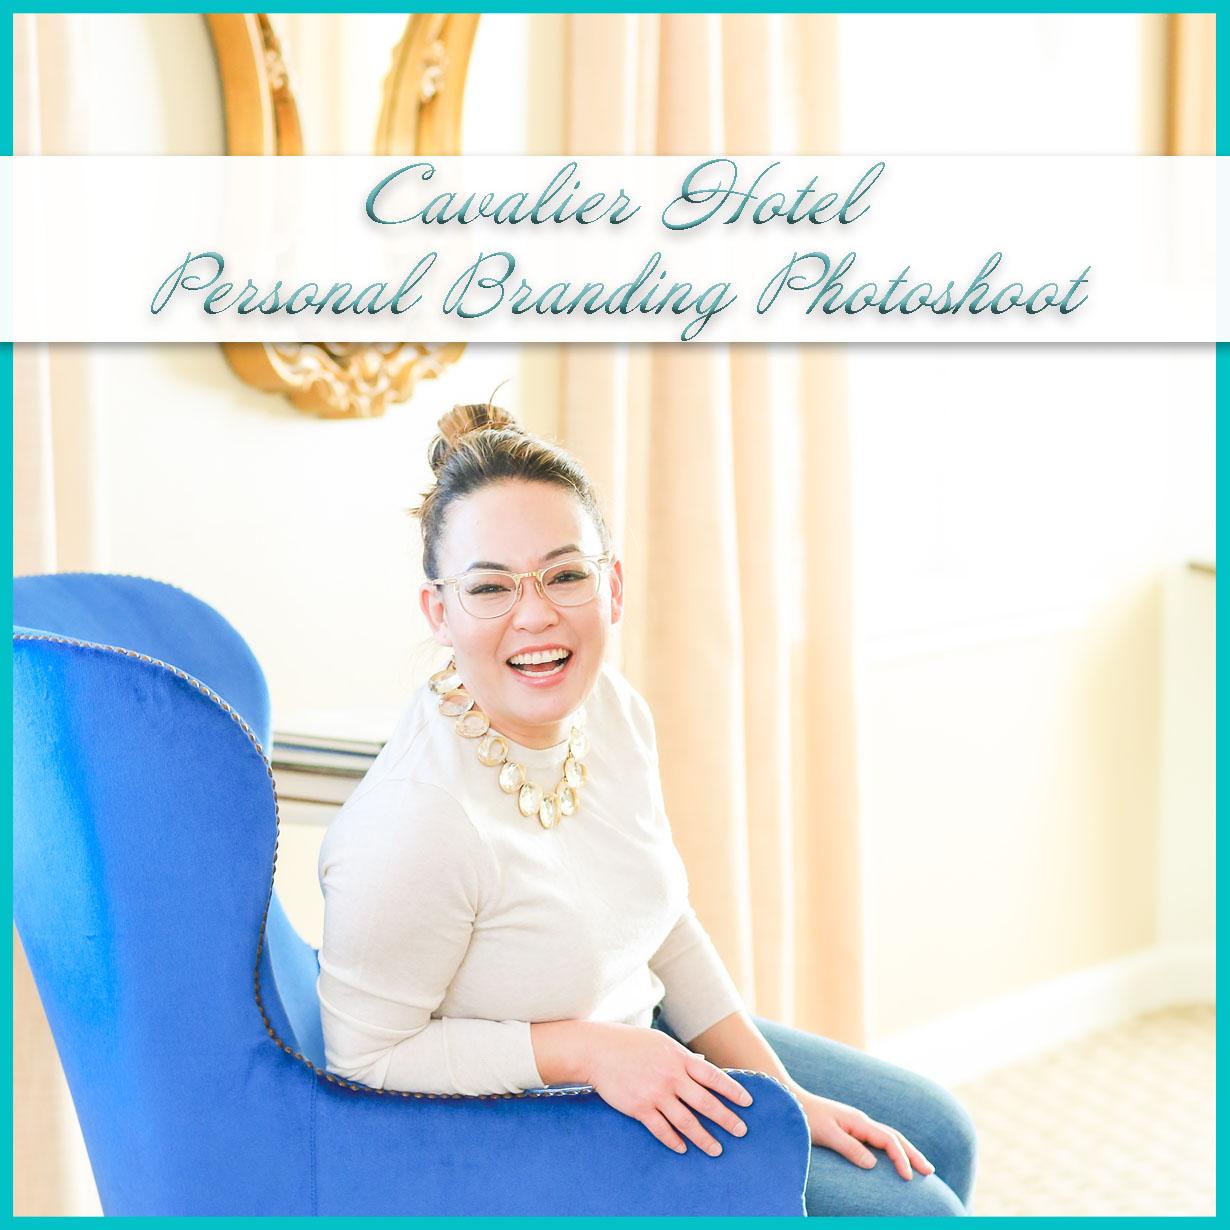 Cavalier Hotel Personal Branding Photoshoot